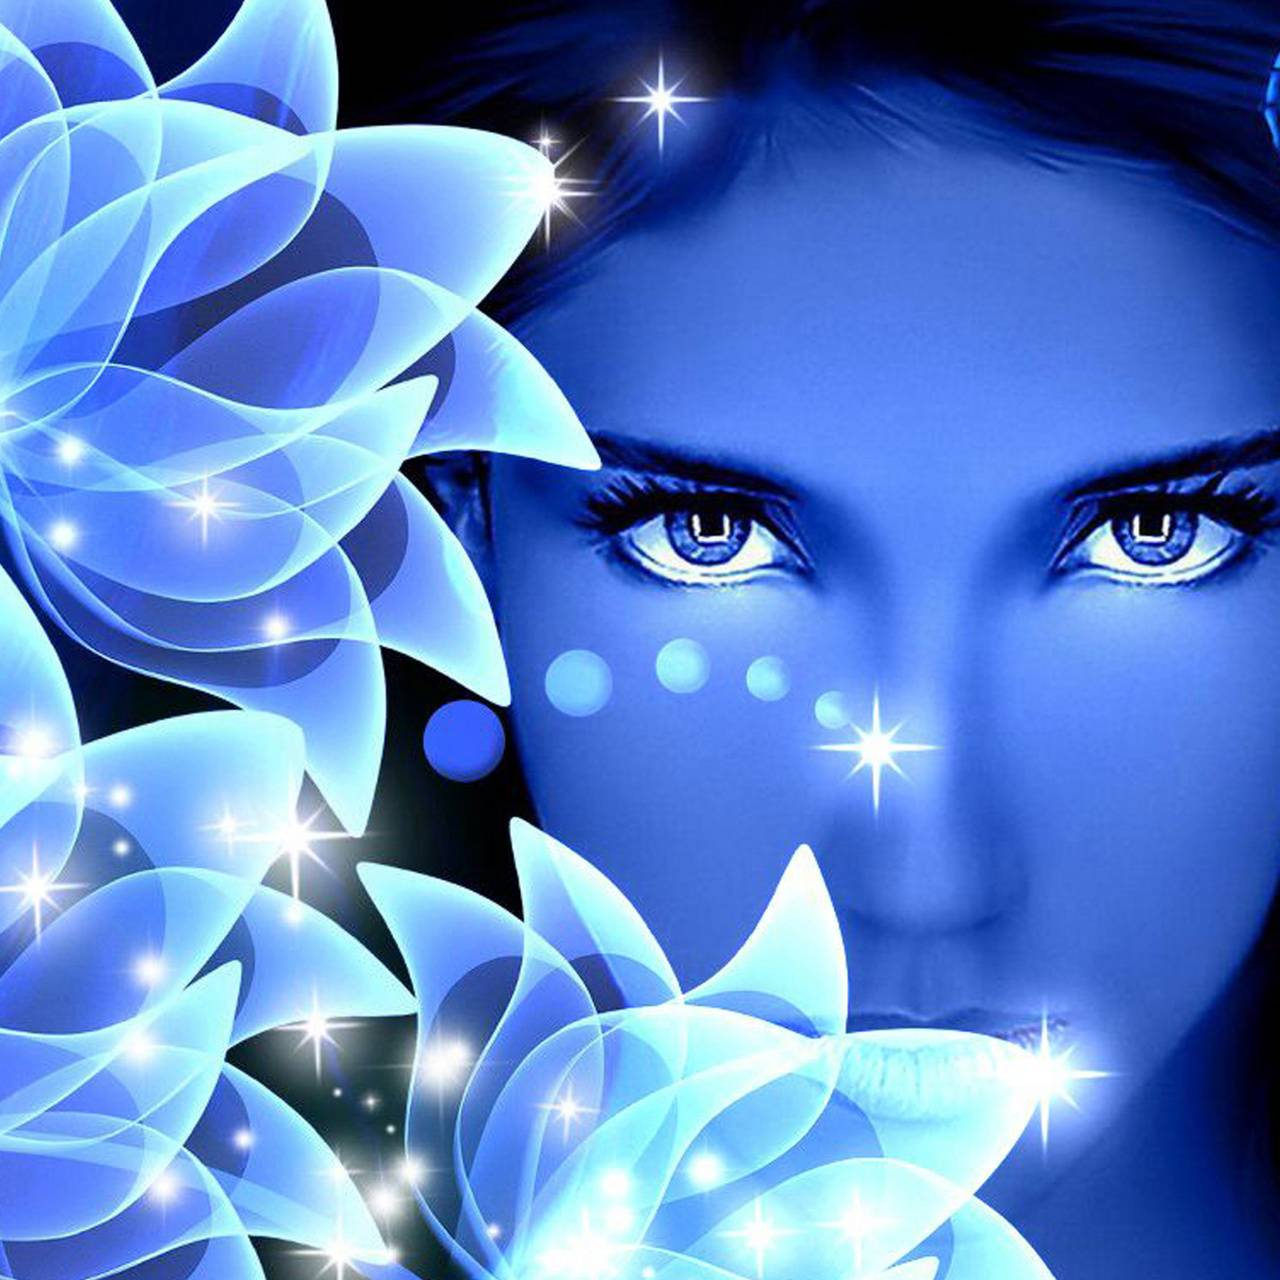 Blue Eyes Rhapsody